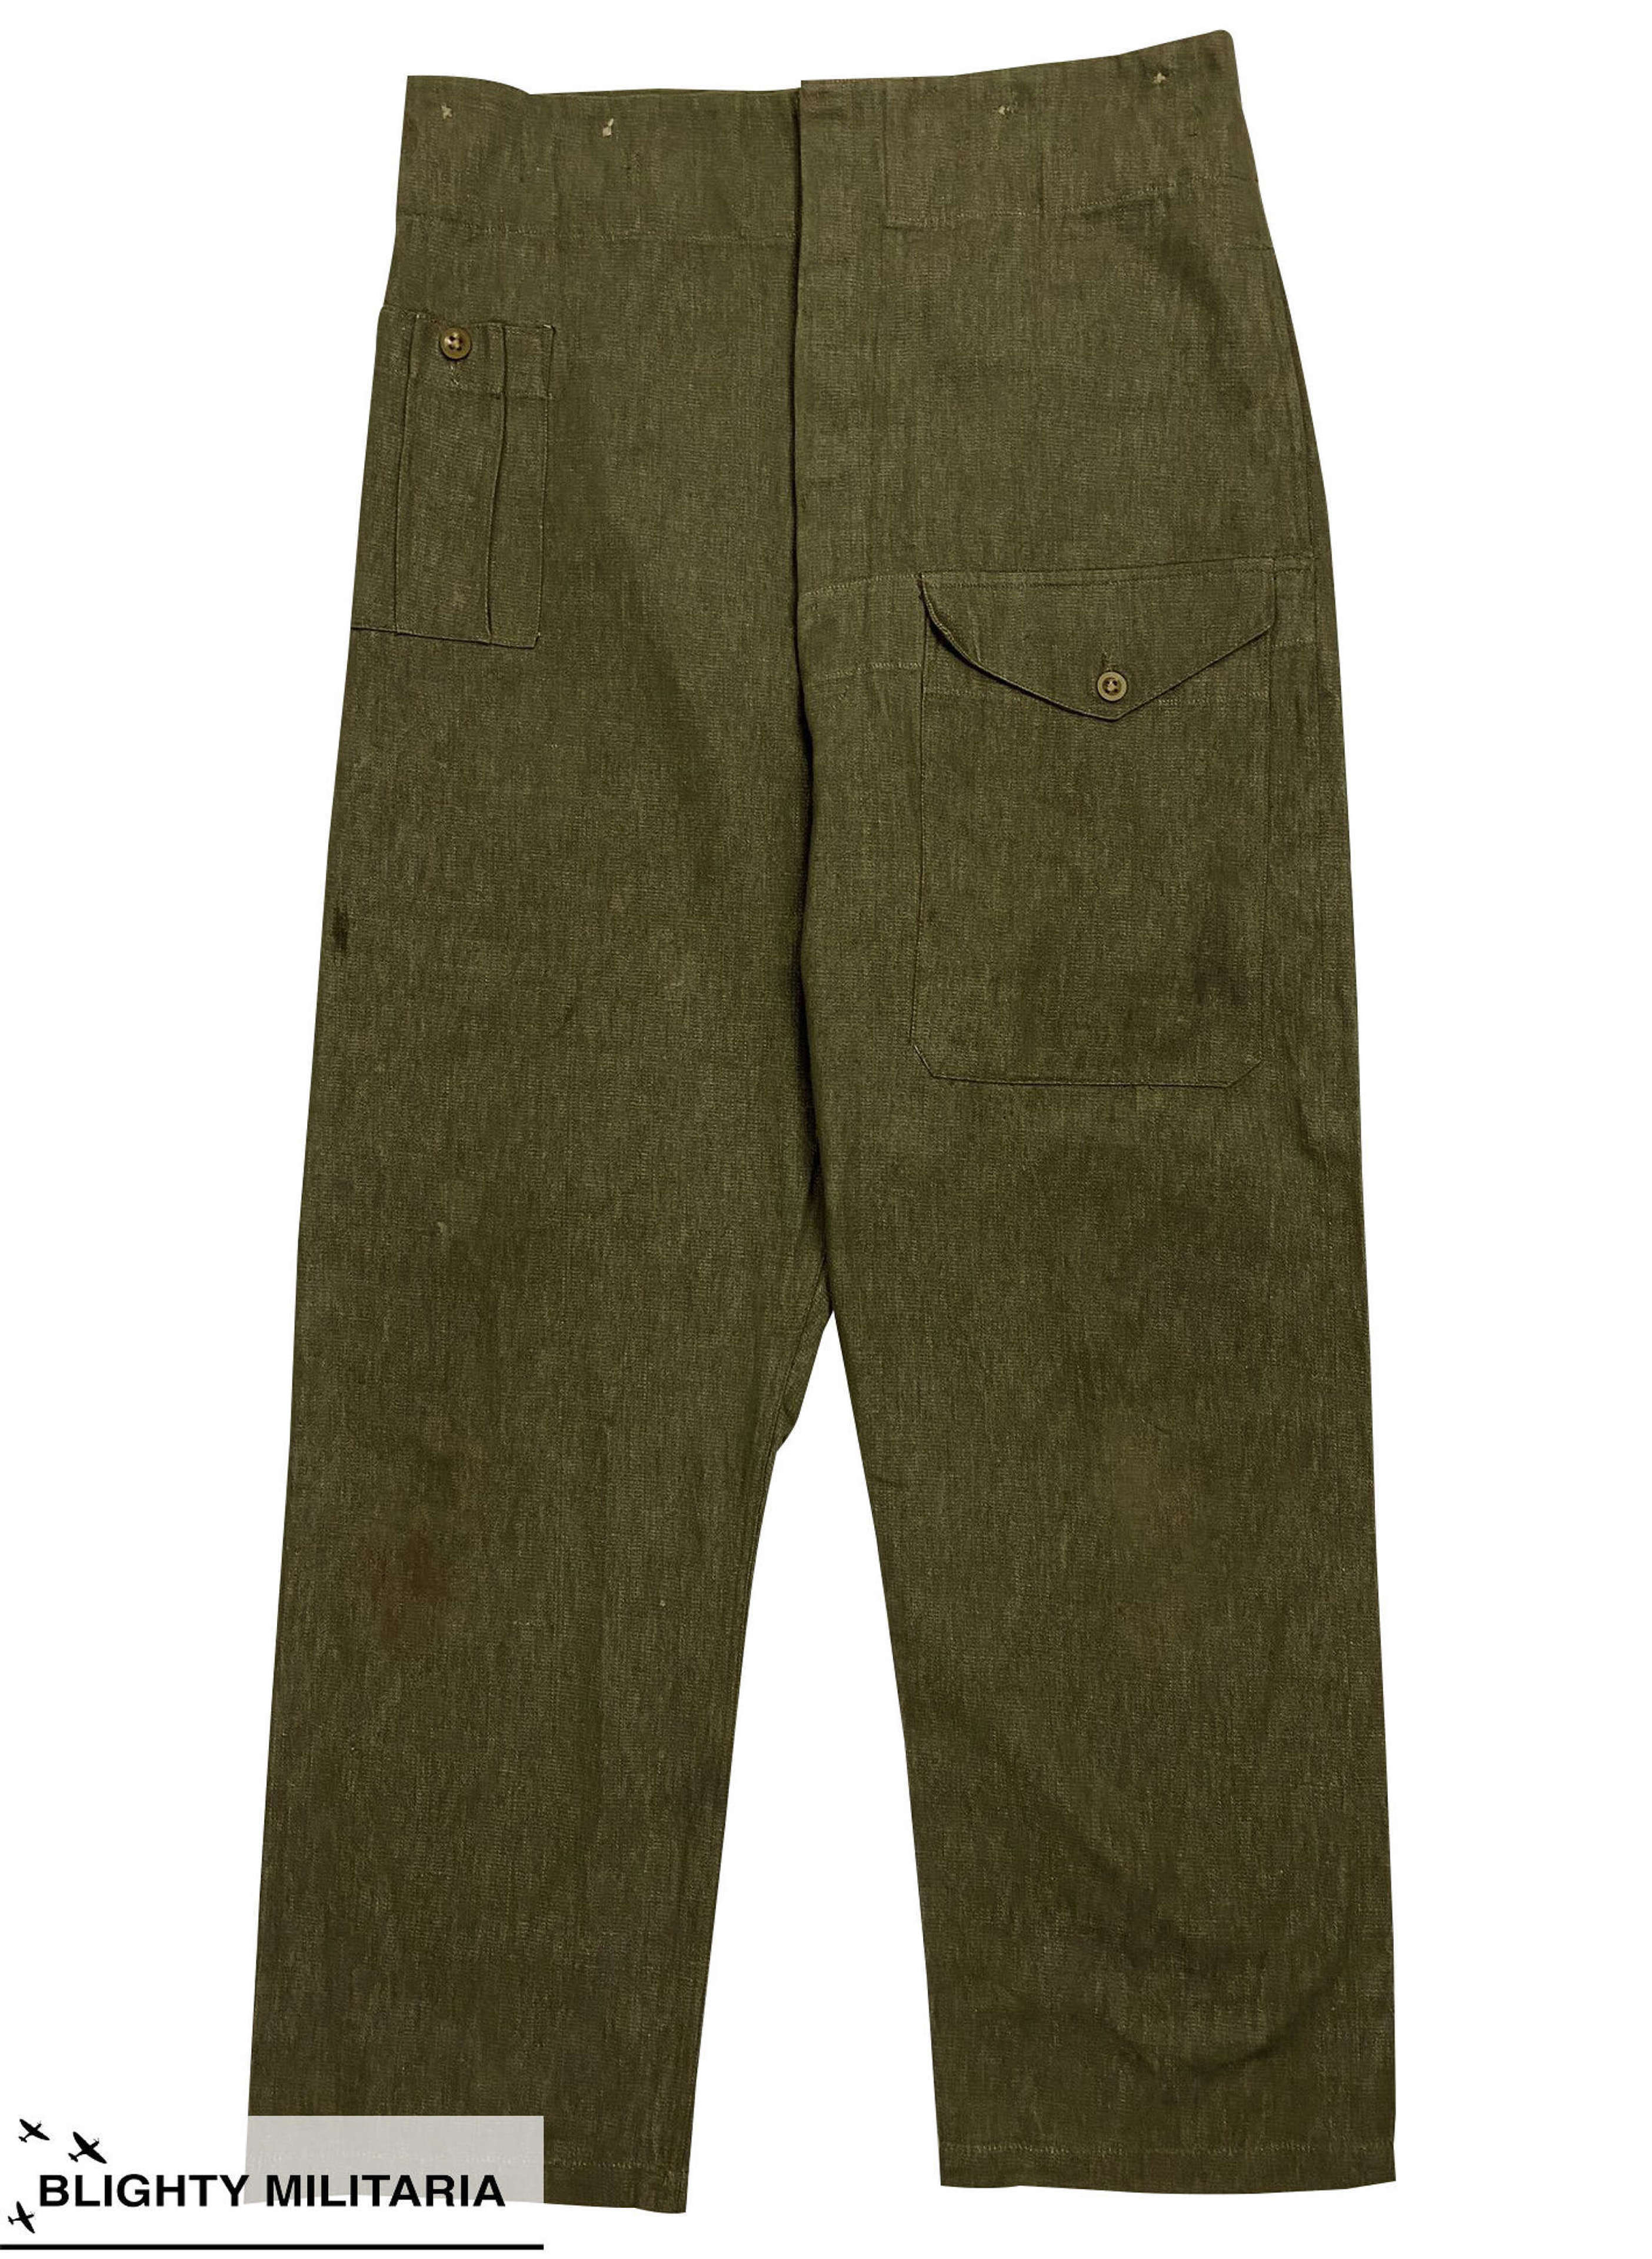 Original 1952 Dated British Denim Battledress Trousers - Size 9